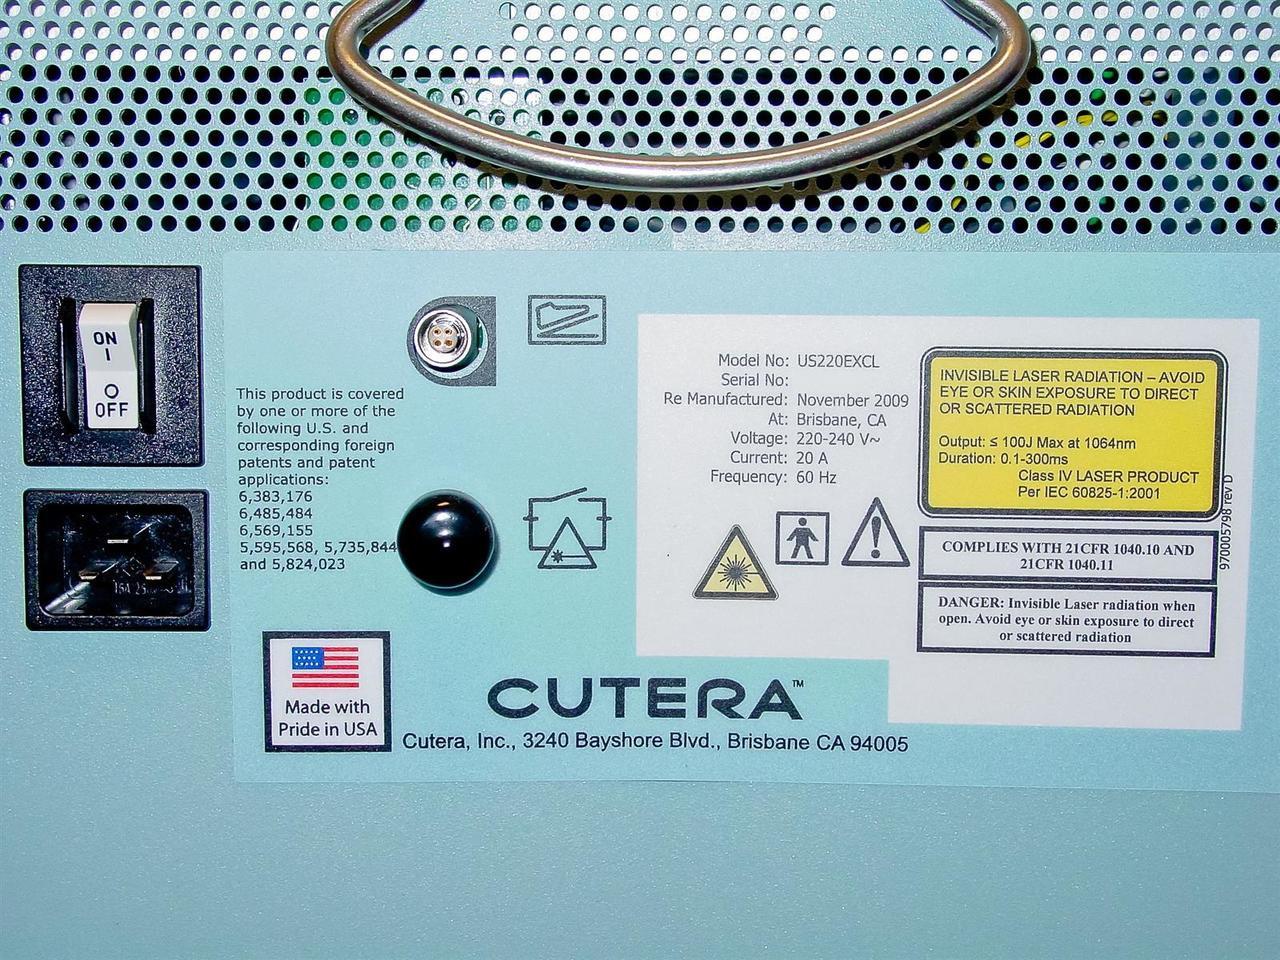 Cutera Us220excl Altus Coolglide Excel Xeo Laser